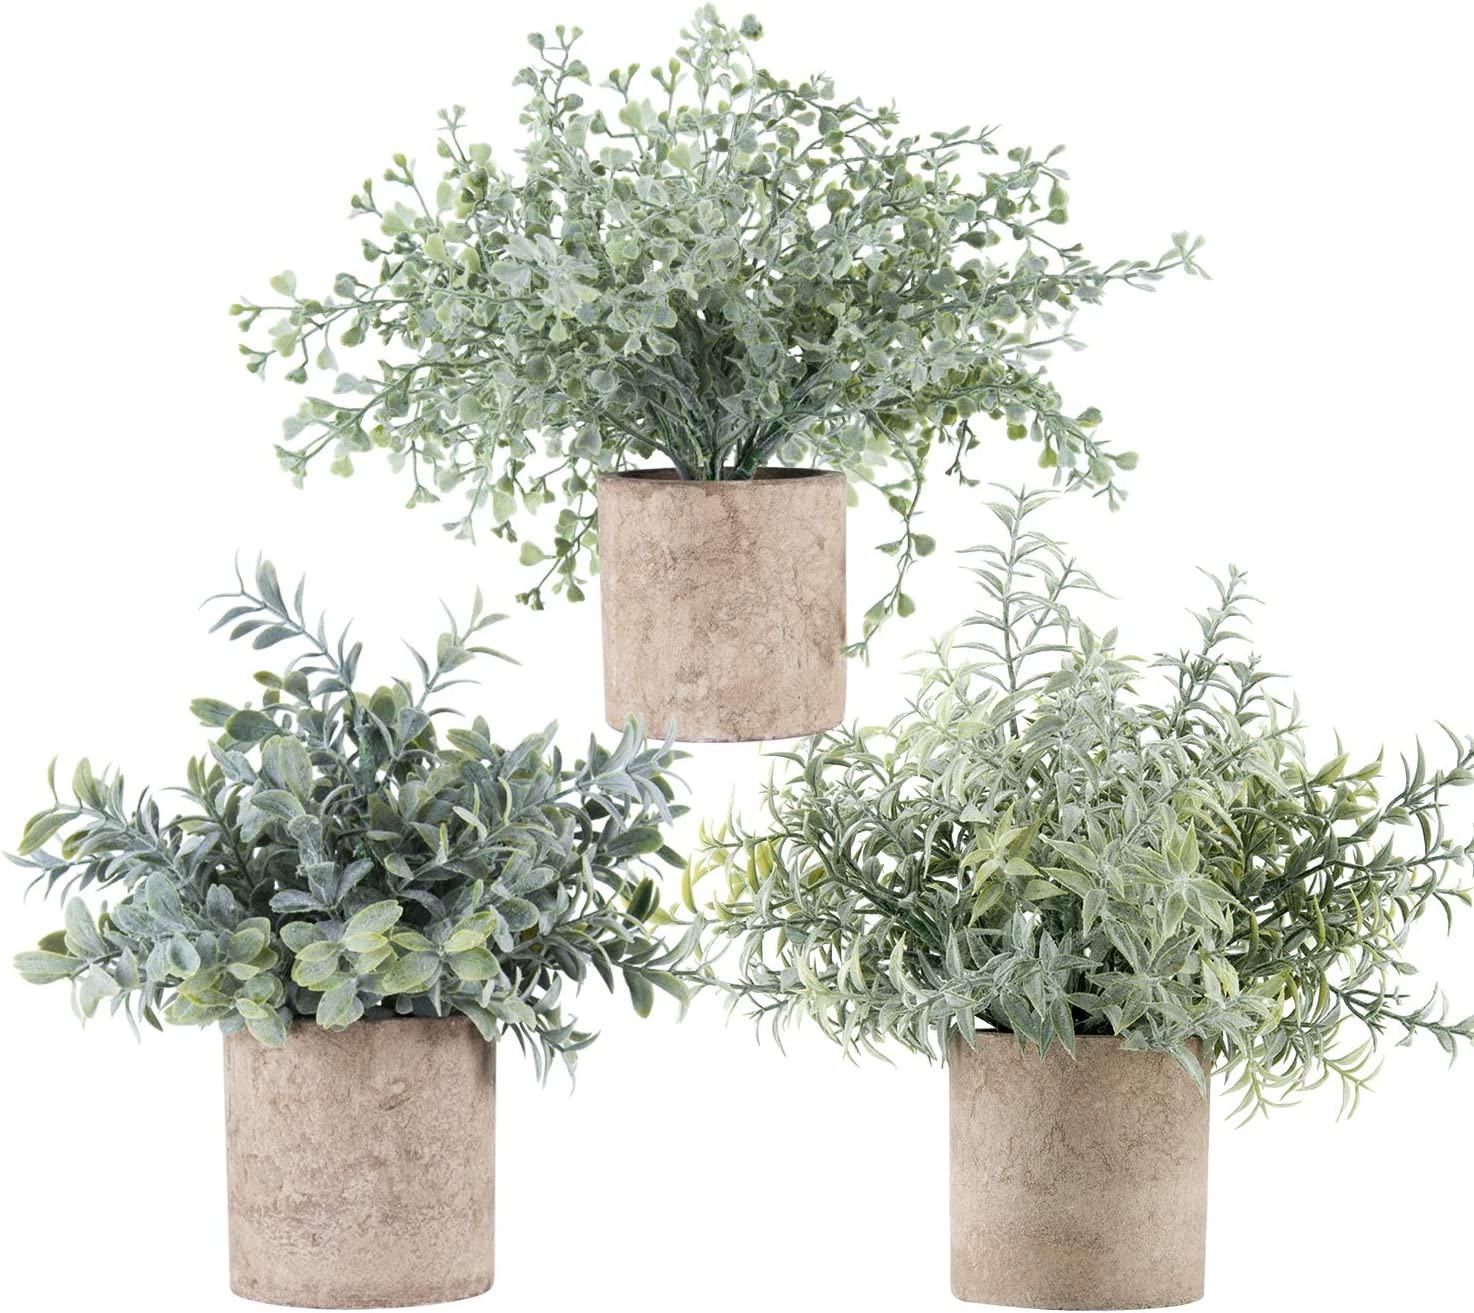 Der Rose 3 Pack Mini Potted Fake Plants Artificial Plastic Eucalyptus Plants for Home Office Desk Room Decoration